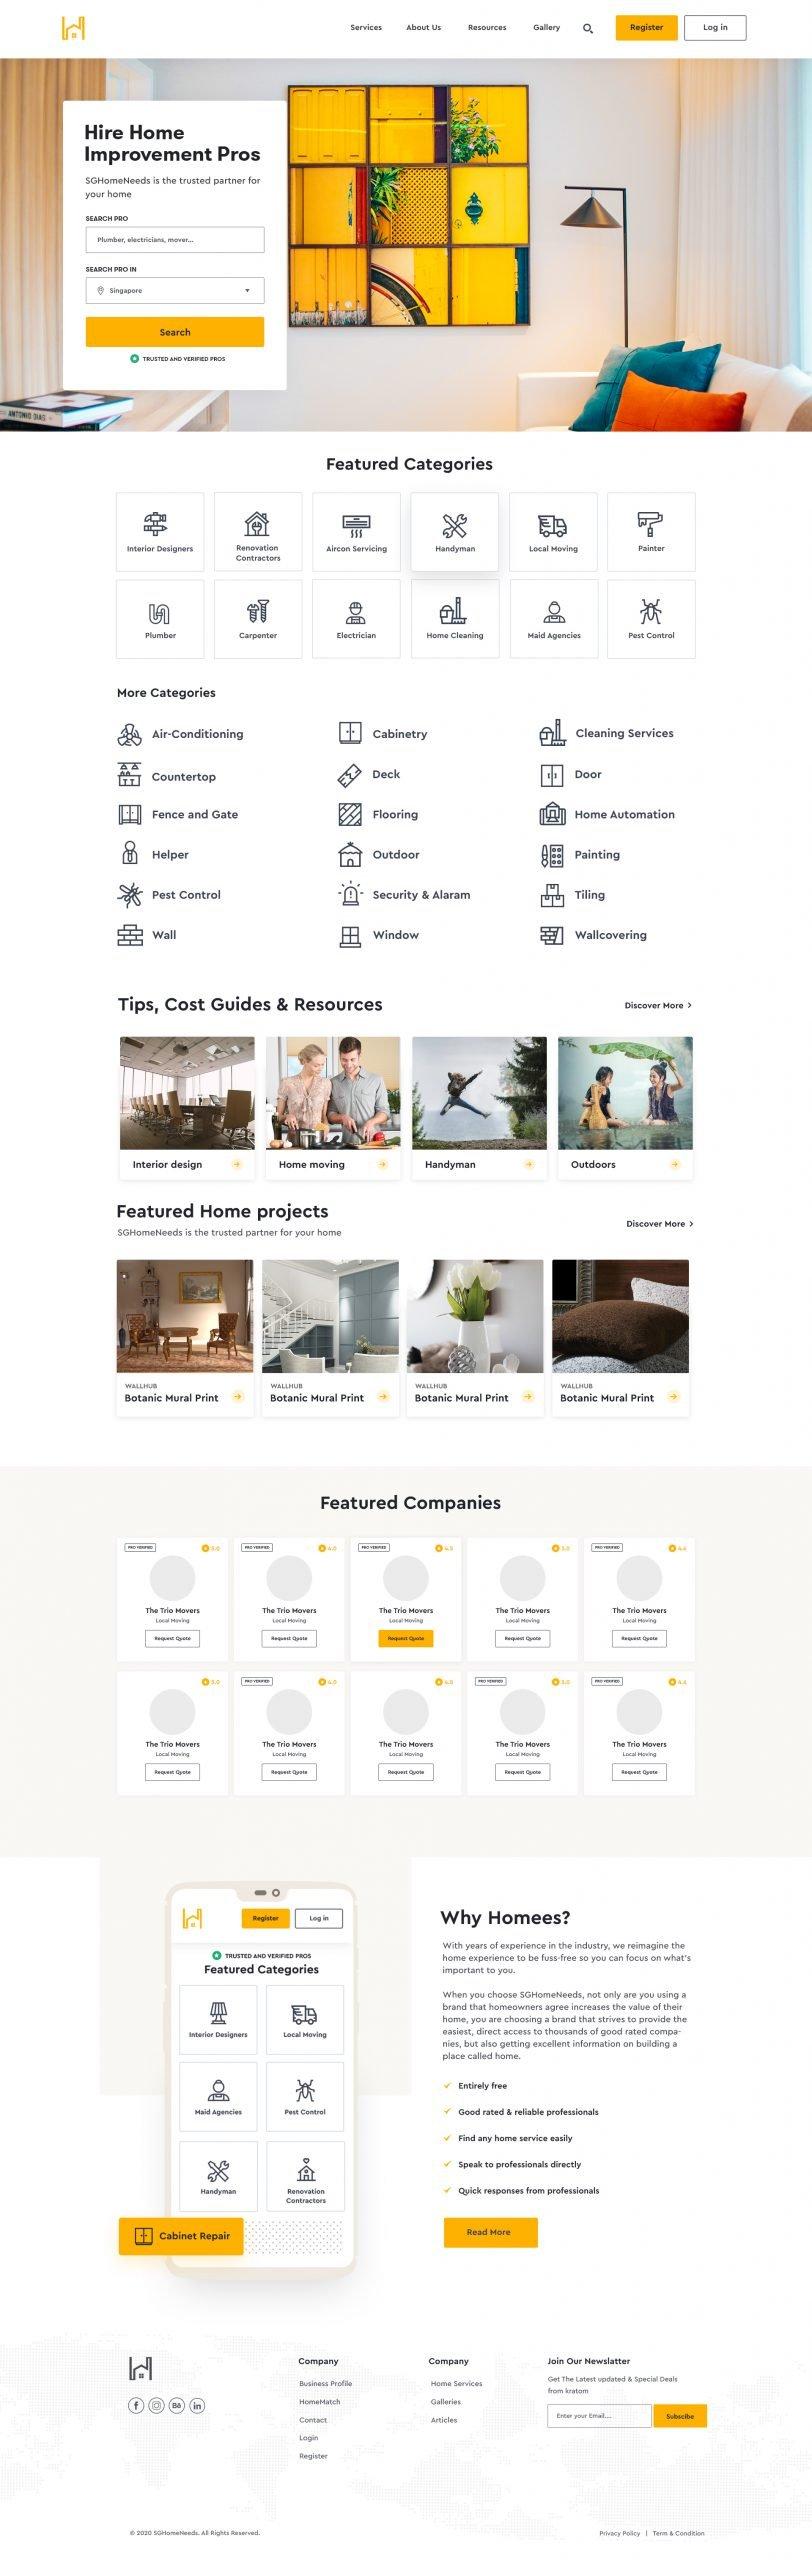 SGHomeNeeds Homepage